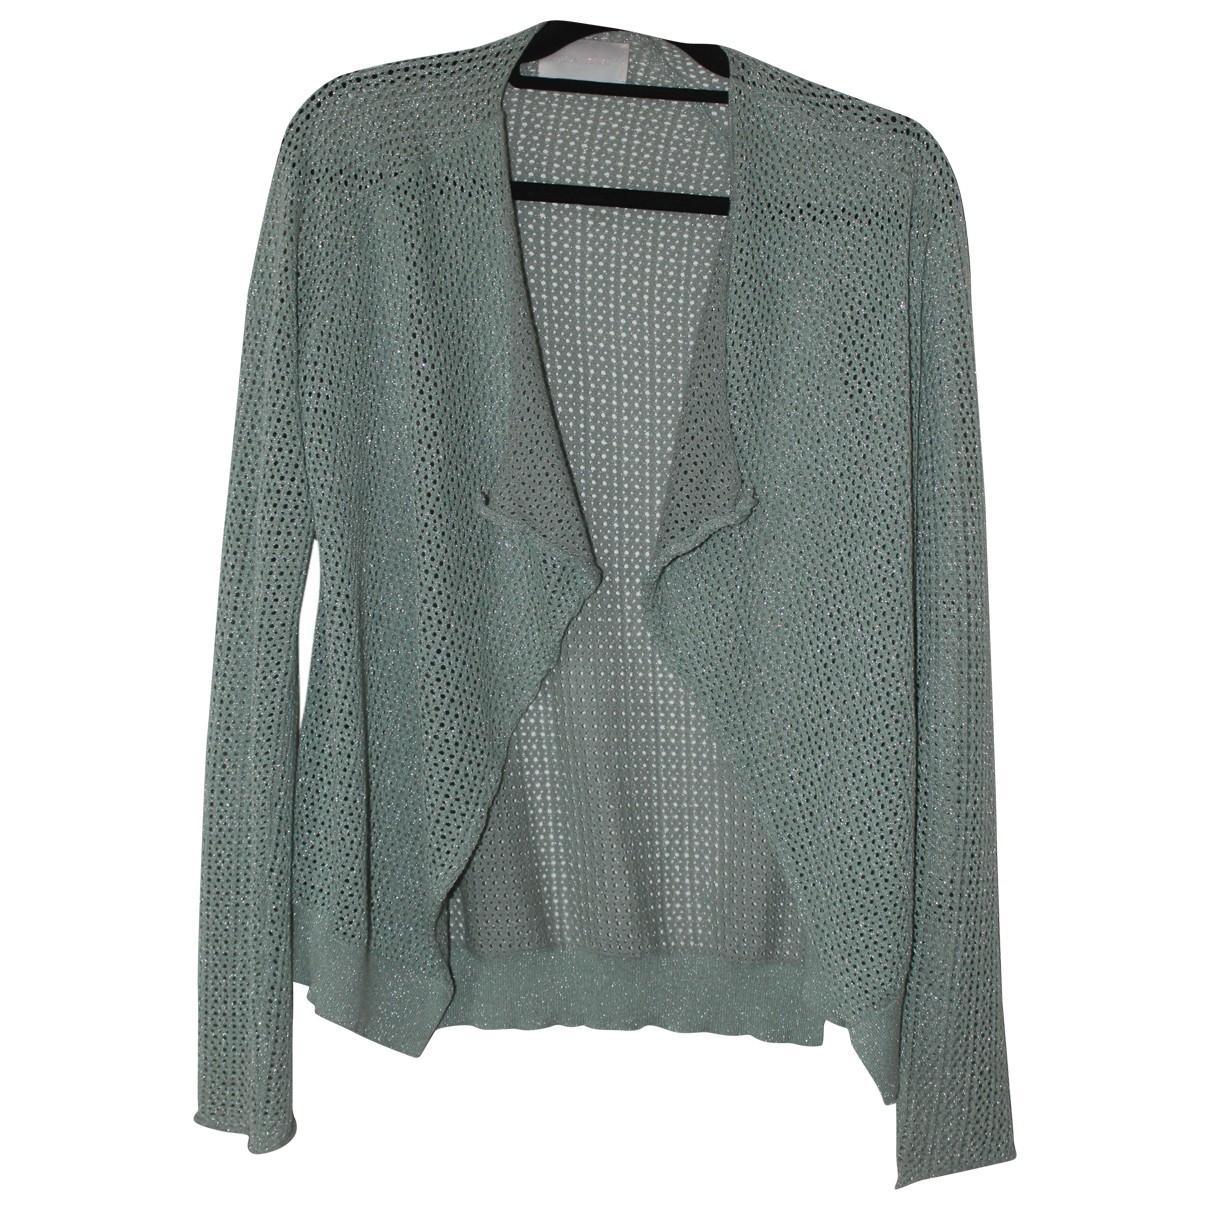 Zadig & Voltaire \N Metallic Knitwear for Women M International